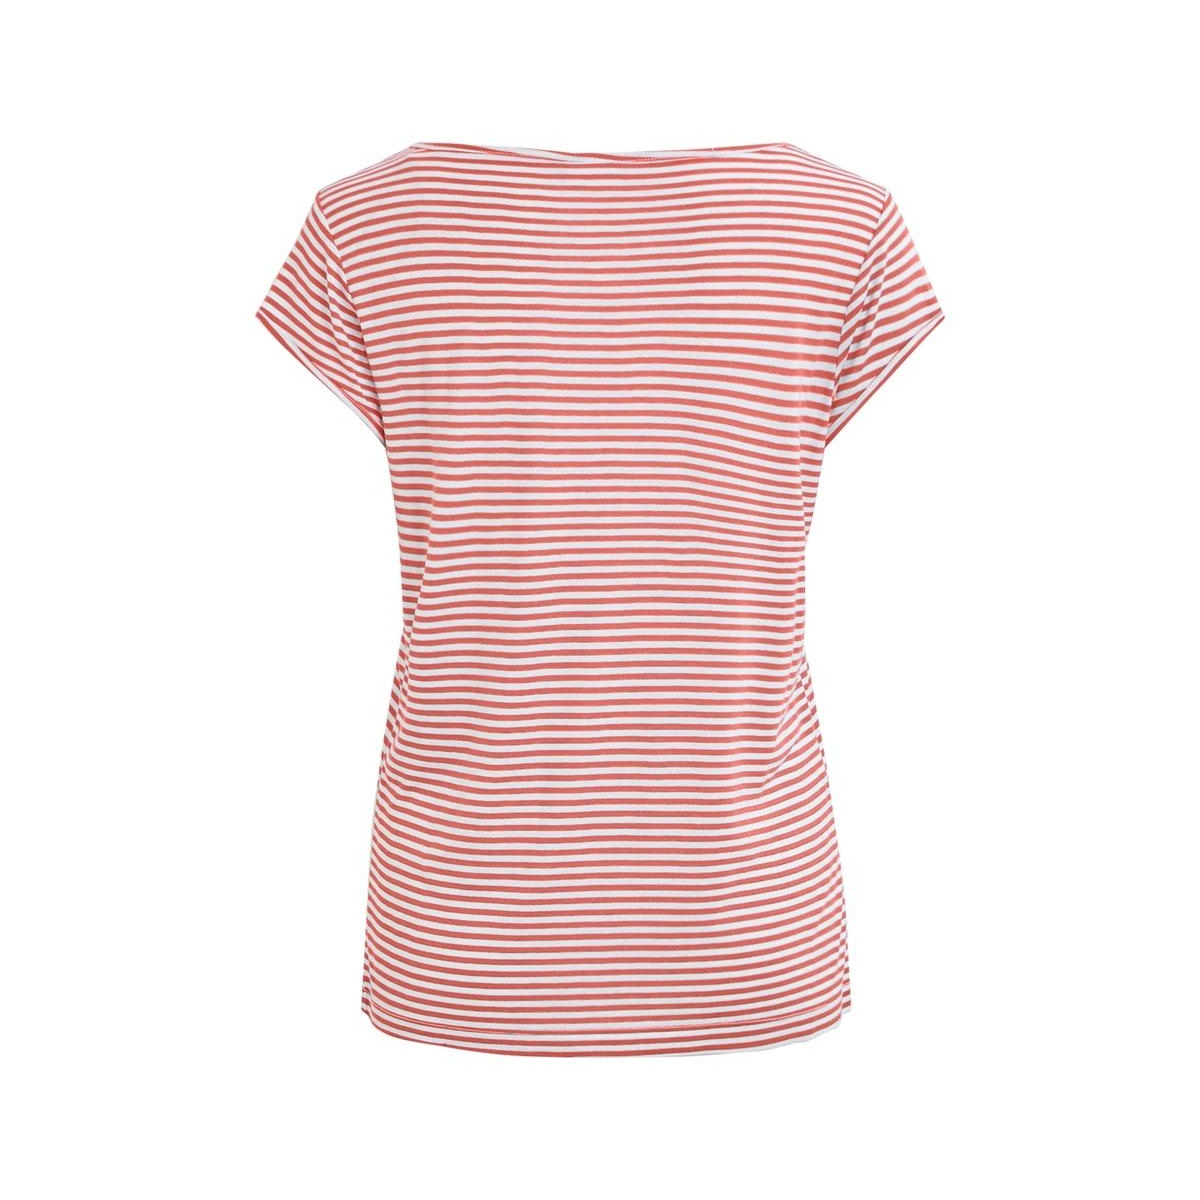 viscoop top - fav 14055569 vila t-shirt dusty cedar/white stripes